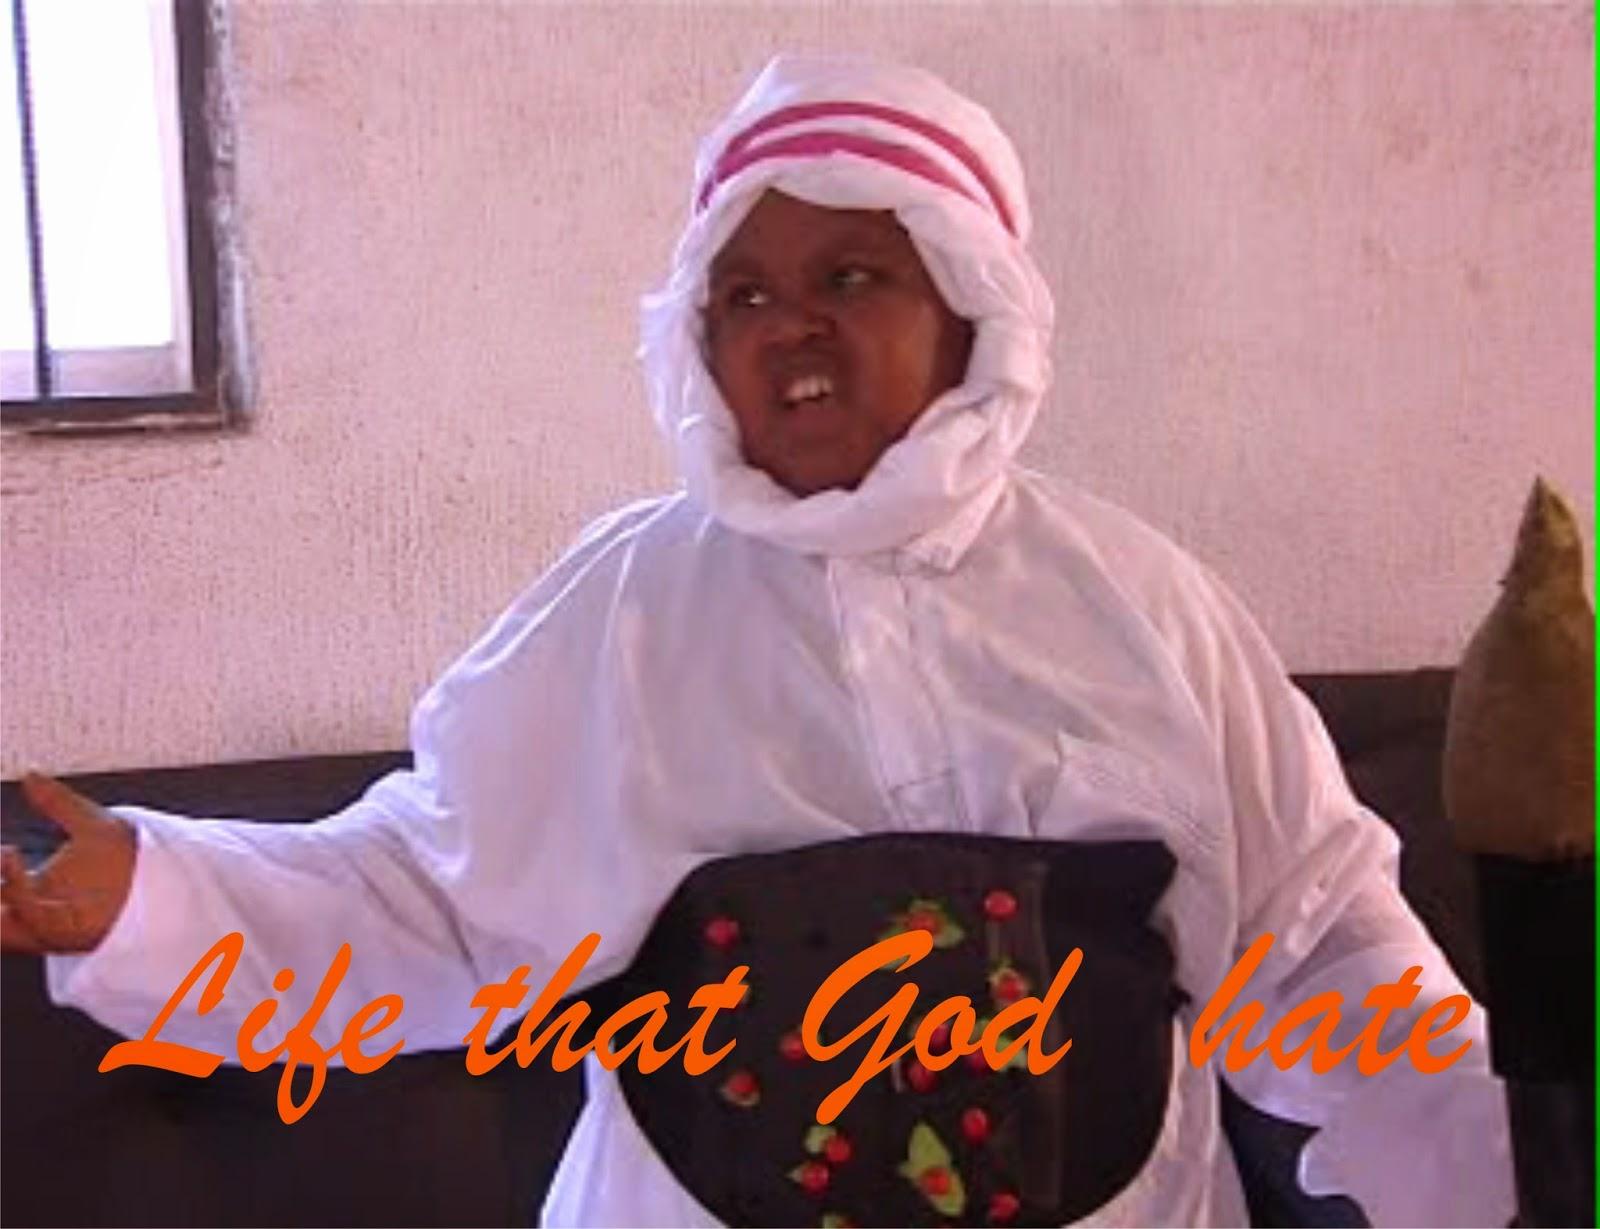 Life that displeases God